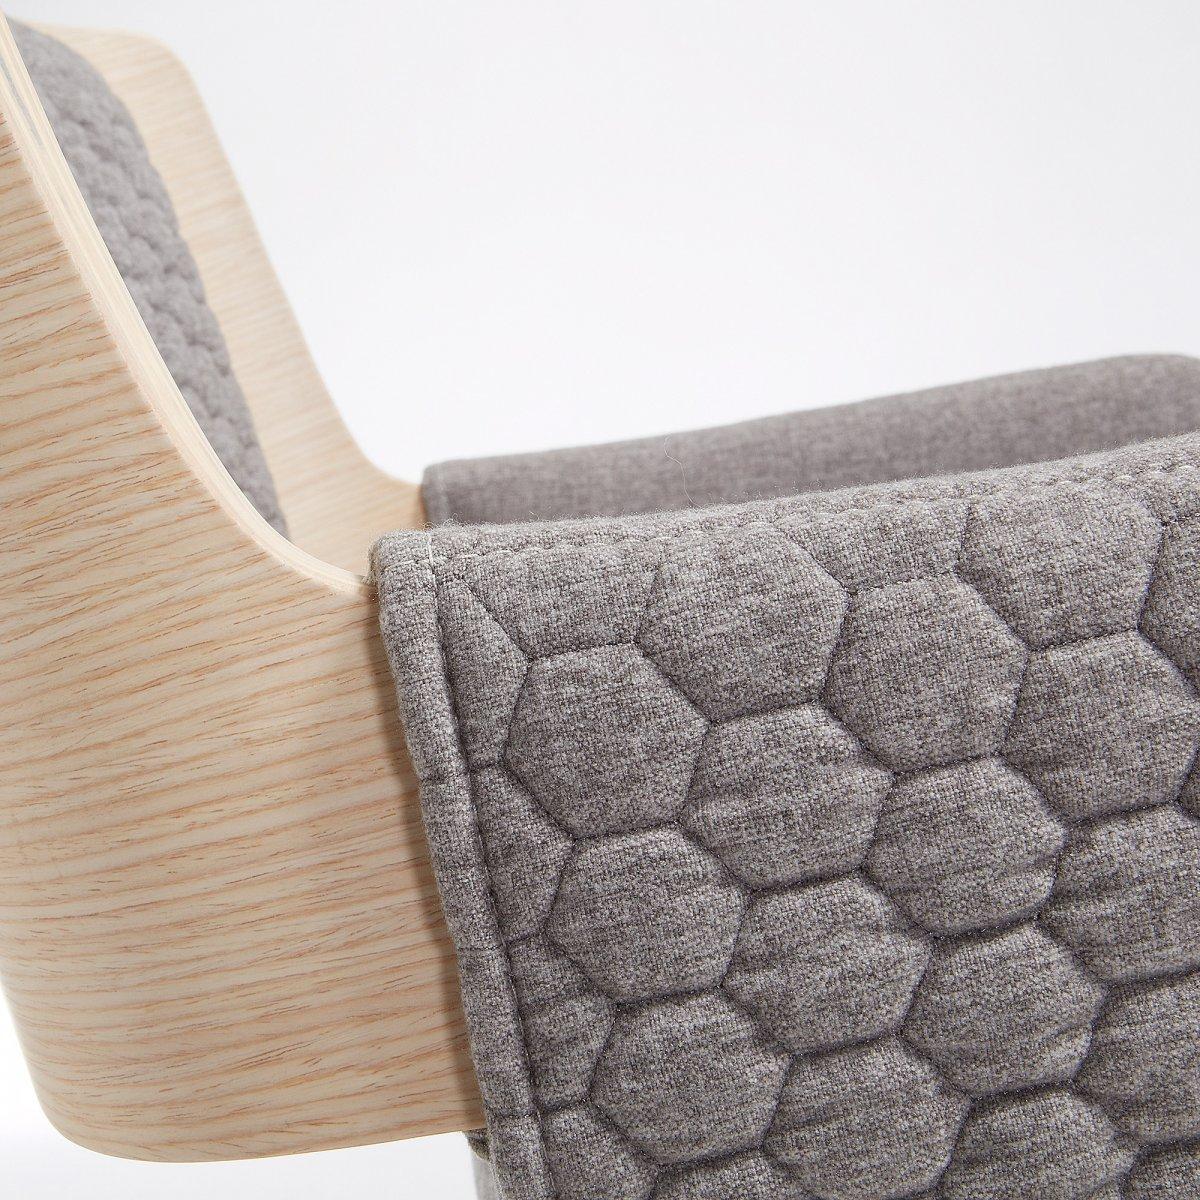 Keihome Linea J ANGIE Sedia braccioli naturale tessuto grigio